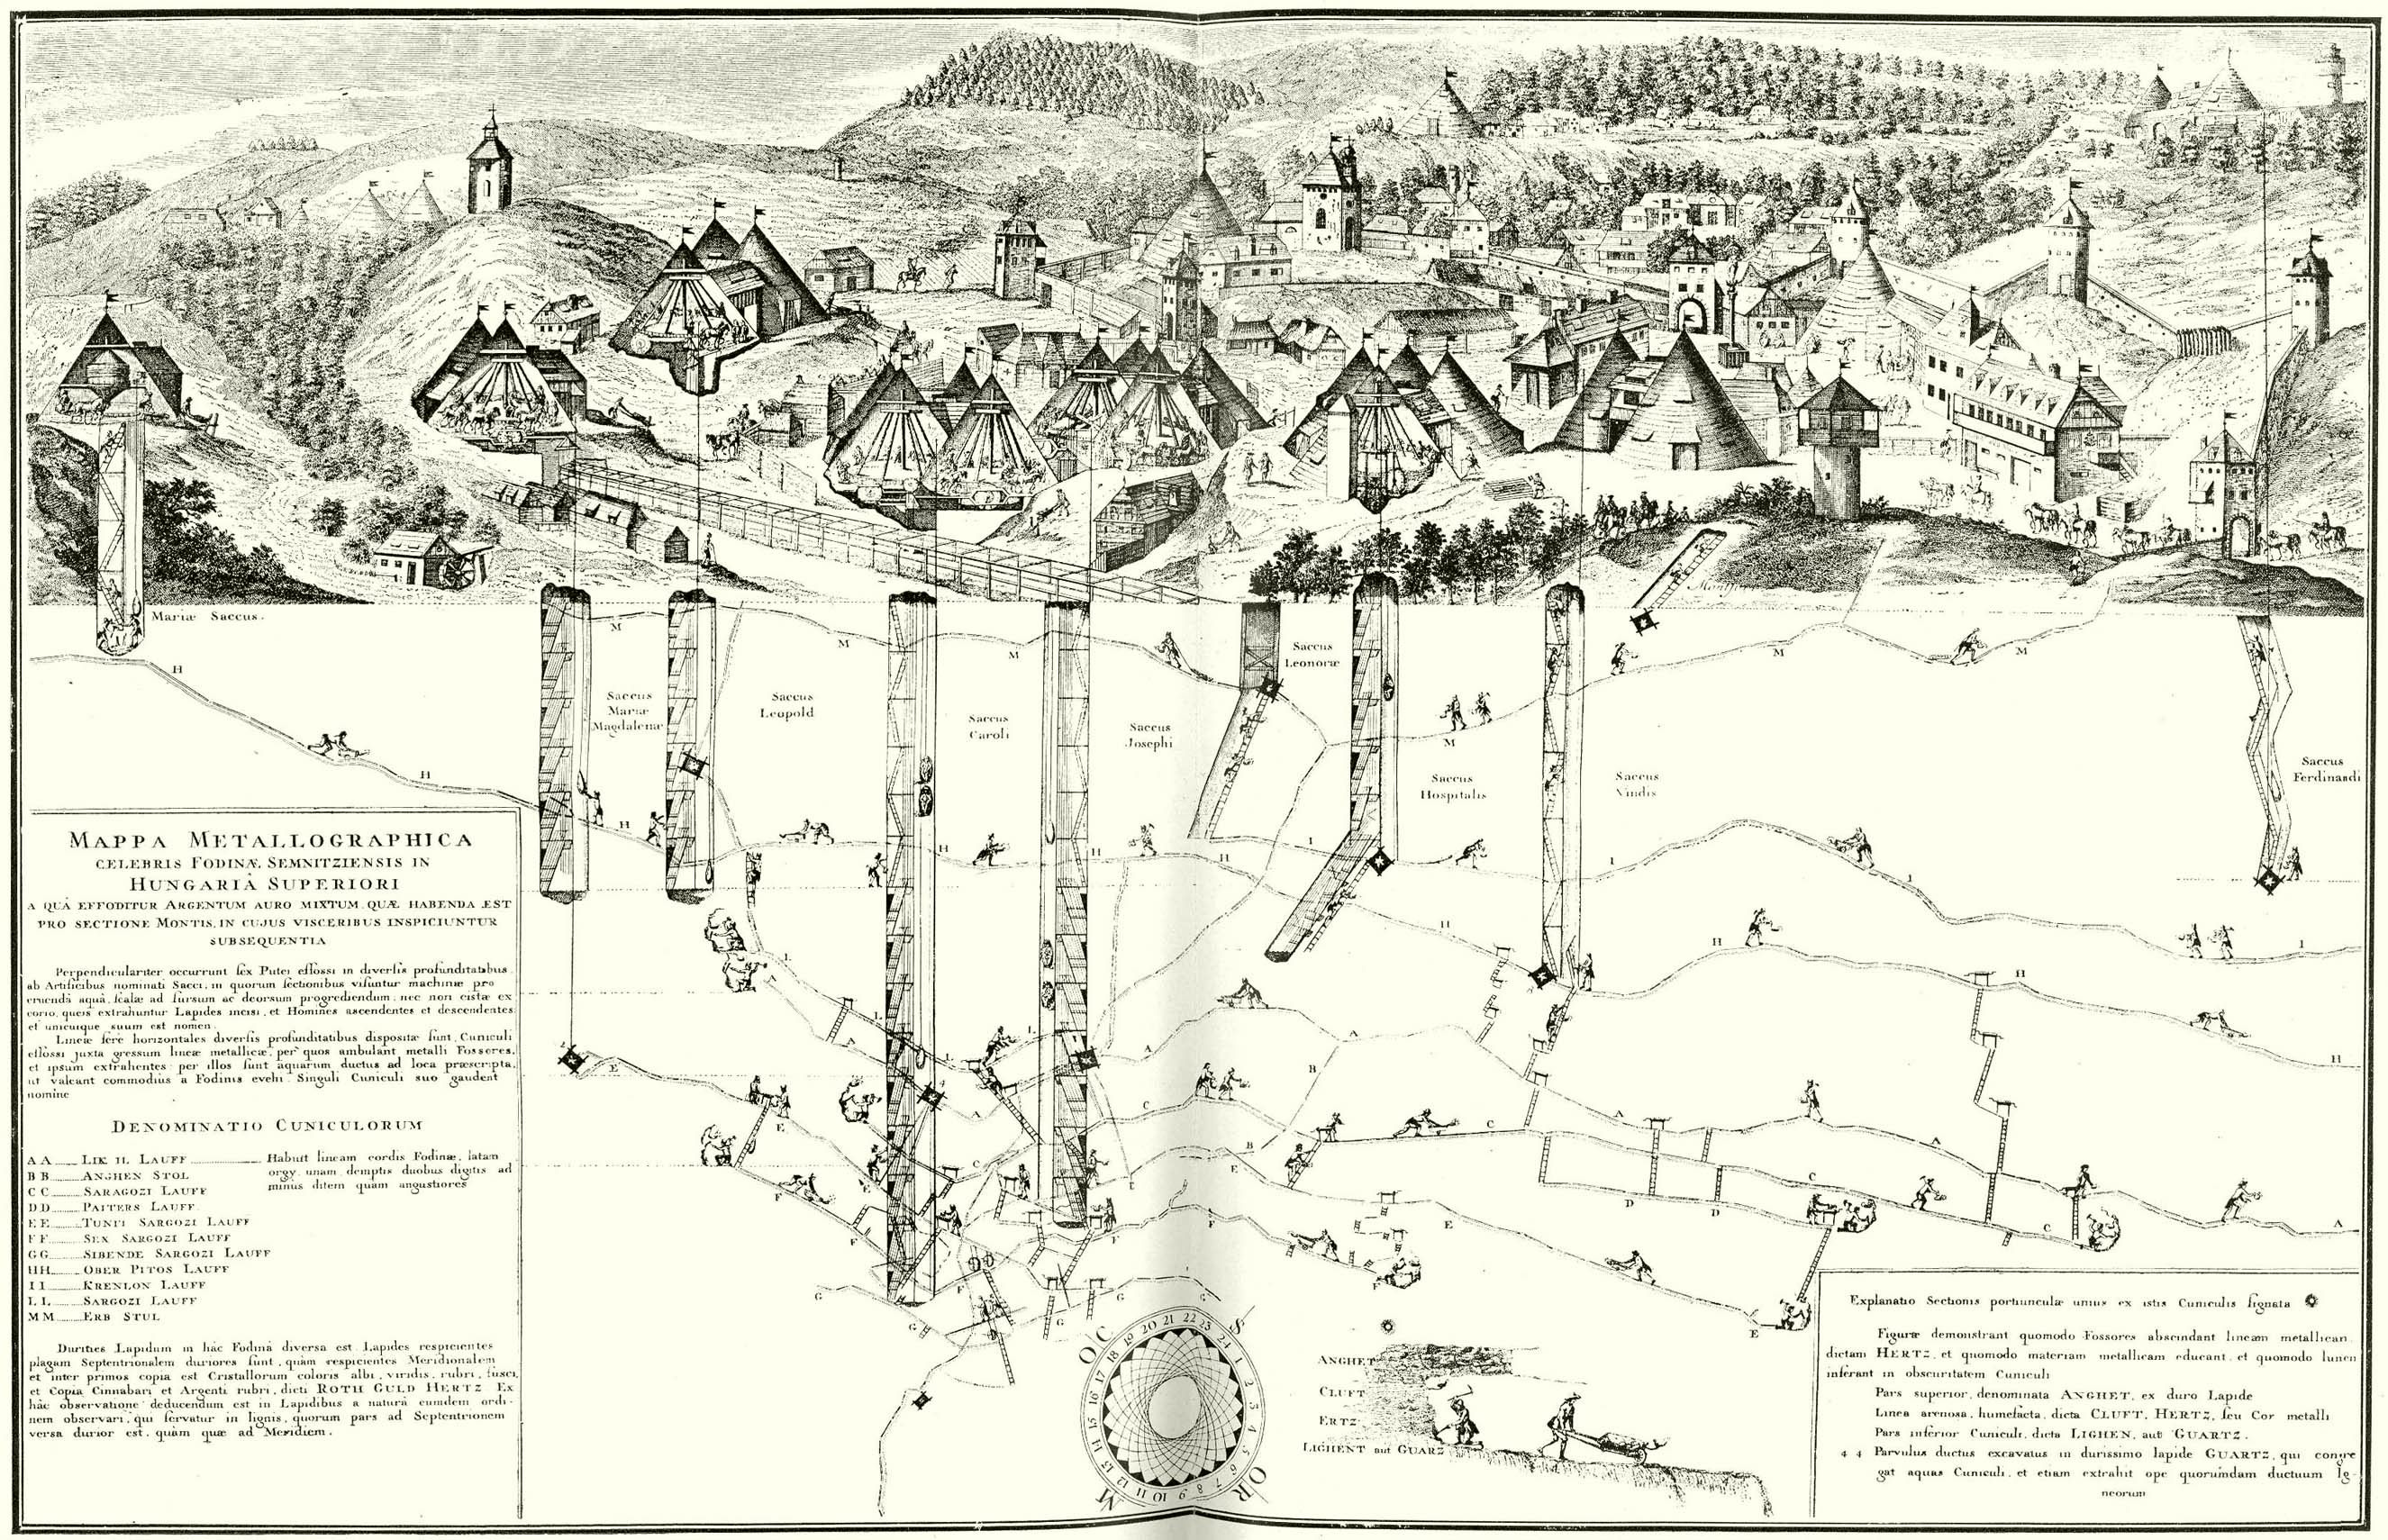 schemnitz_in_danubius_pannonico-mysicus_1726_by_marsigli.jpg